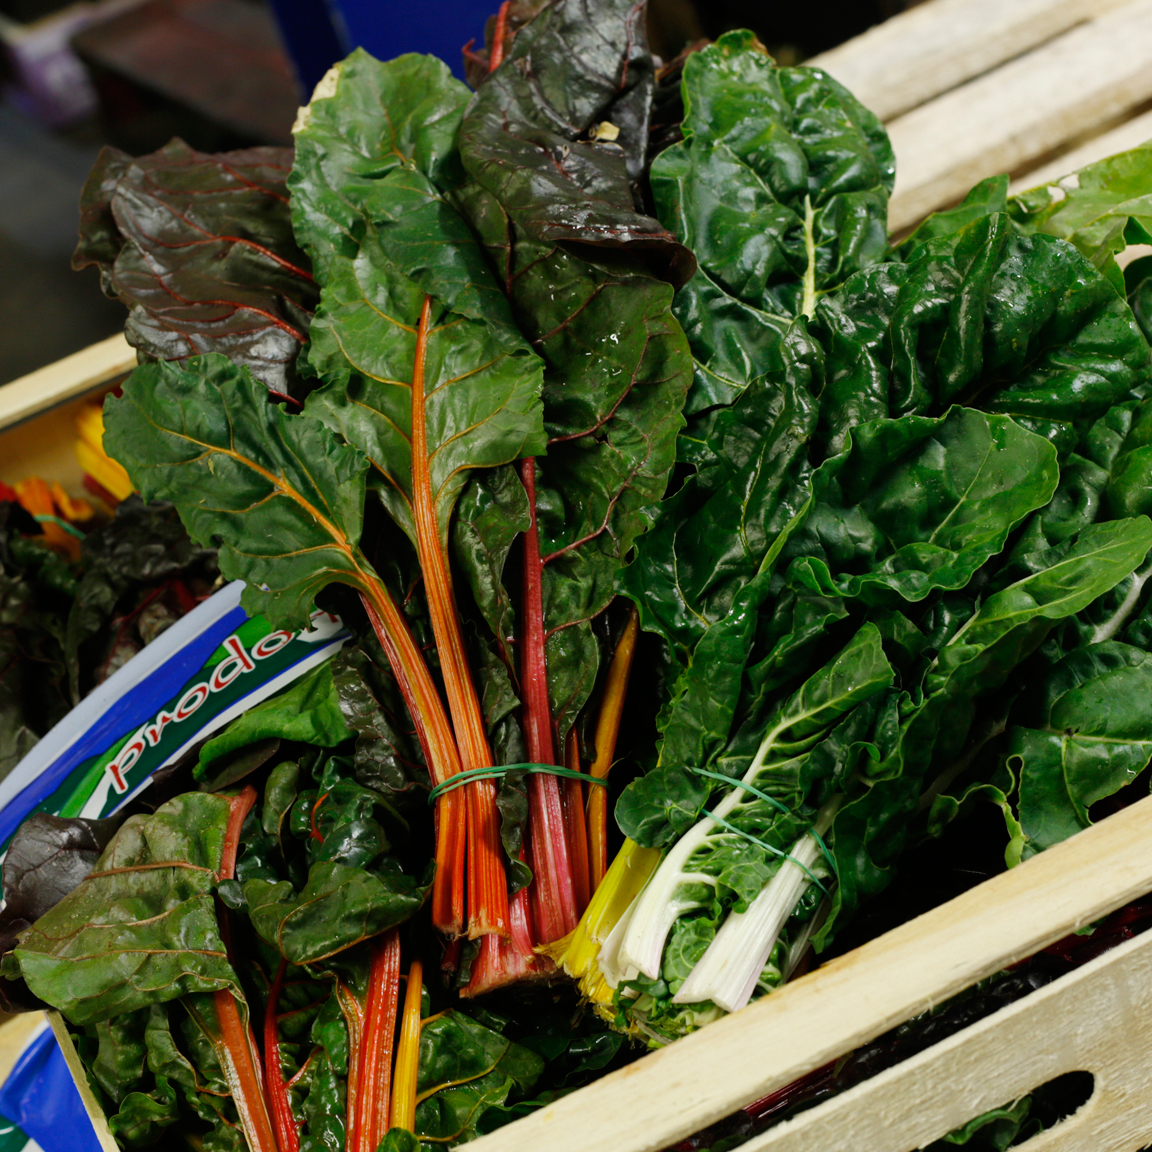 Fruit & Vegetable Wholesale Suppliers | Quality Fresh Produce | Tony